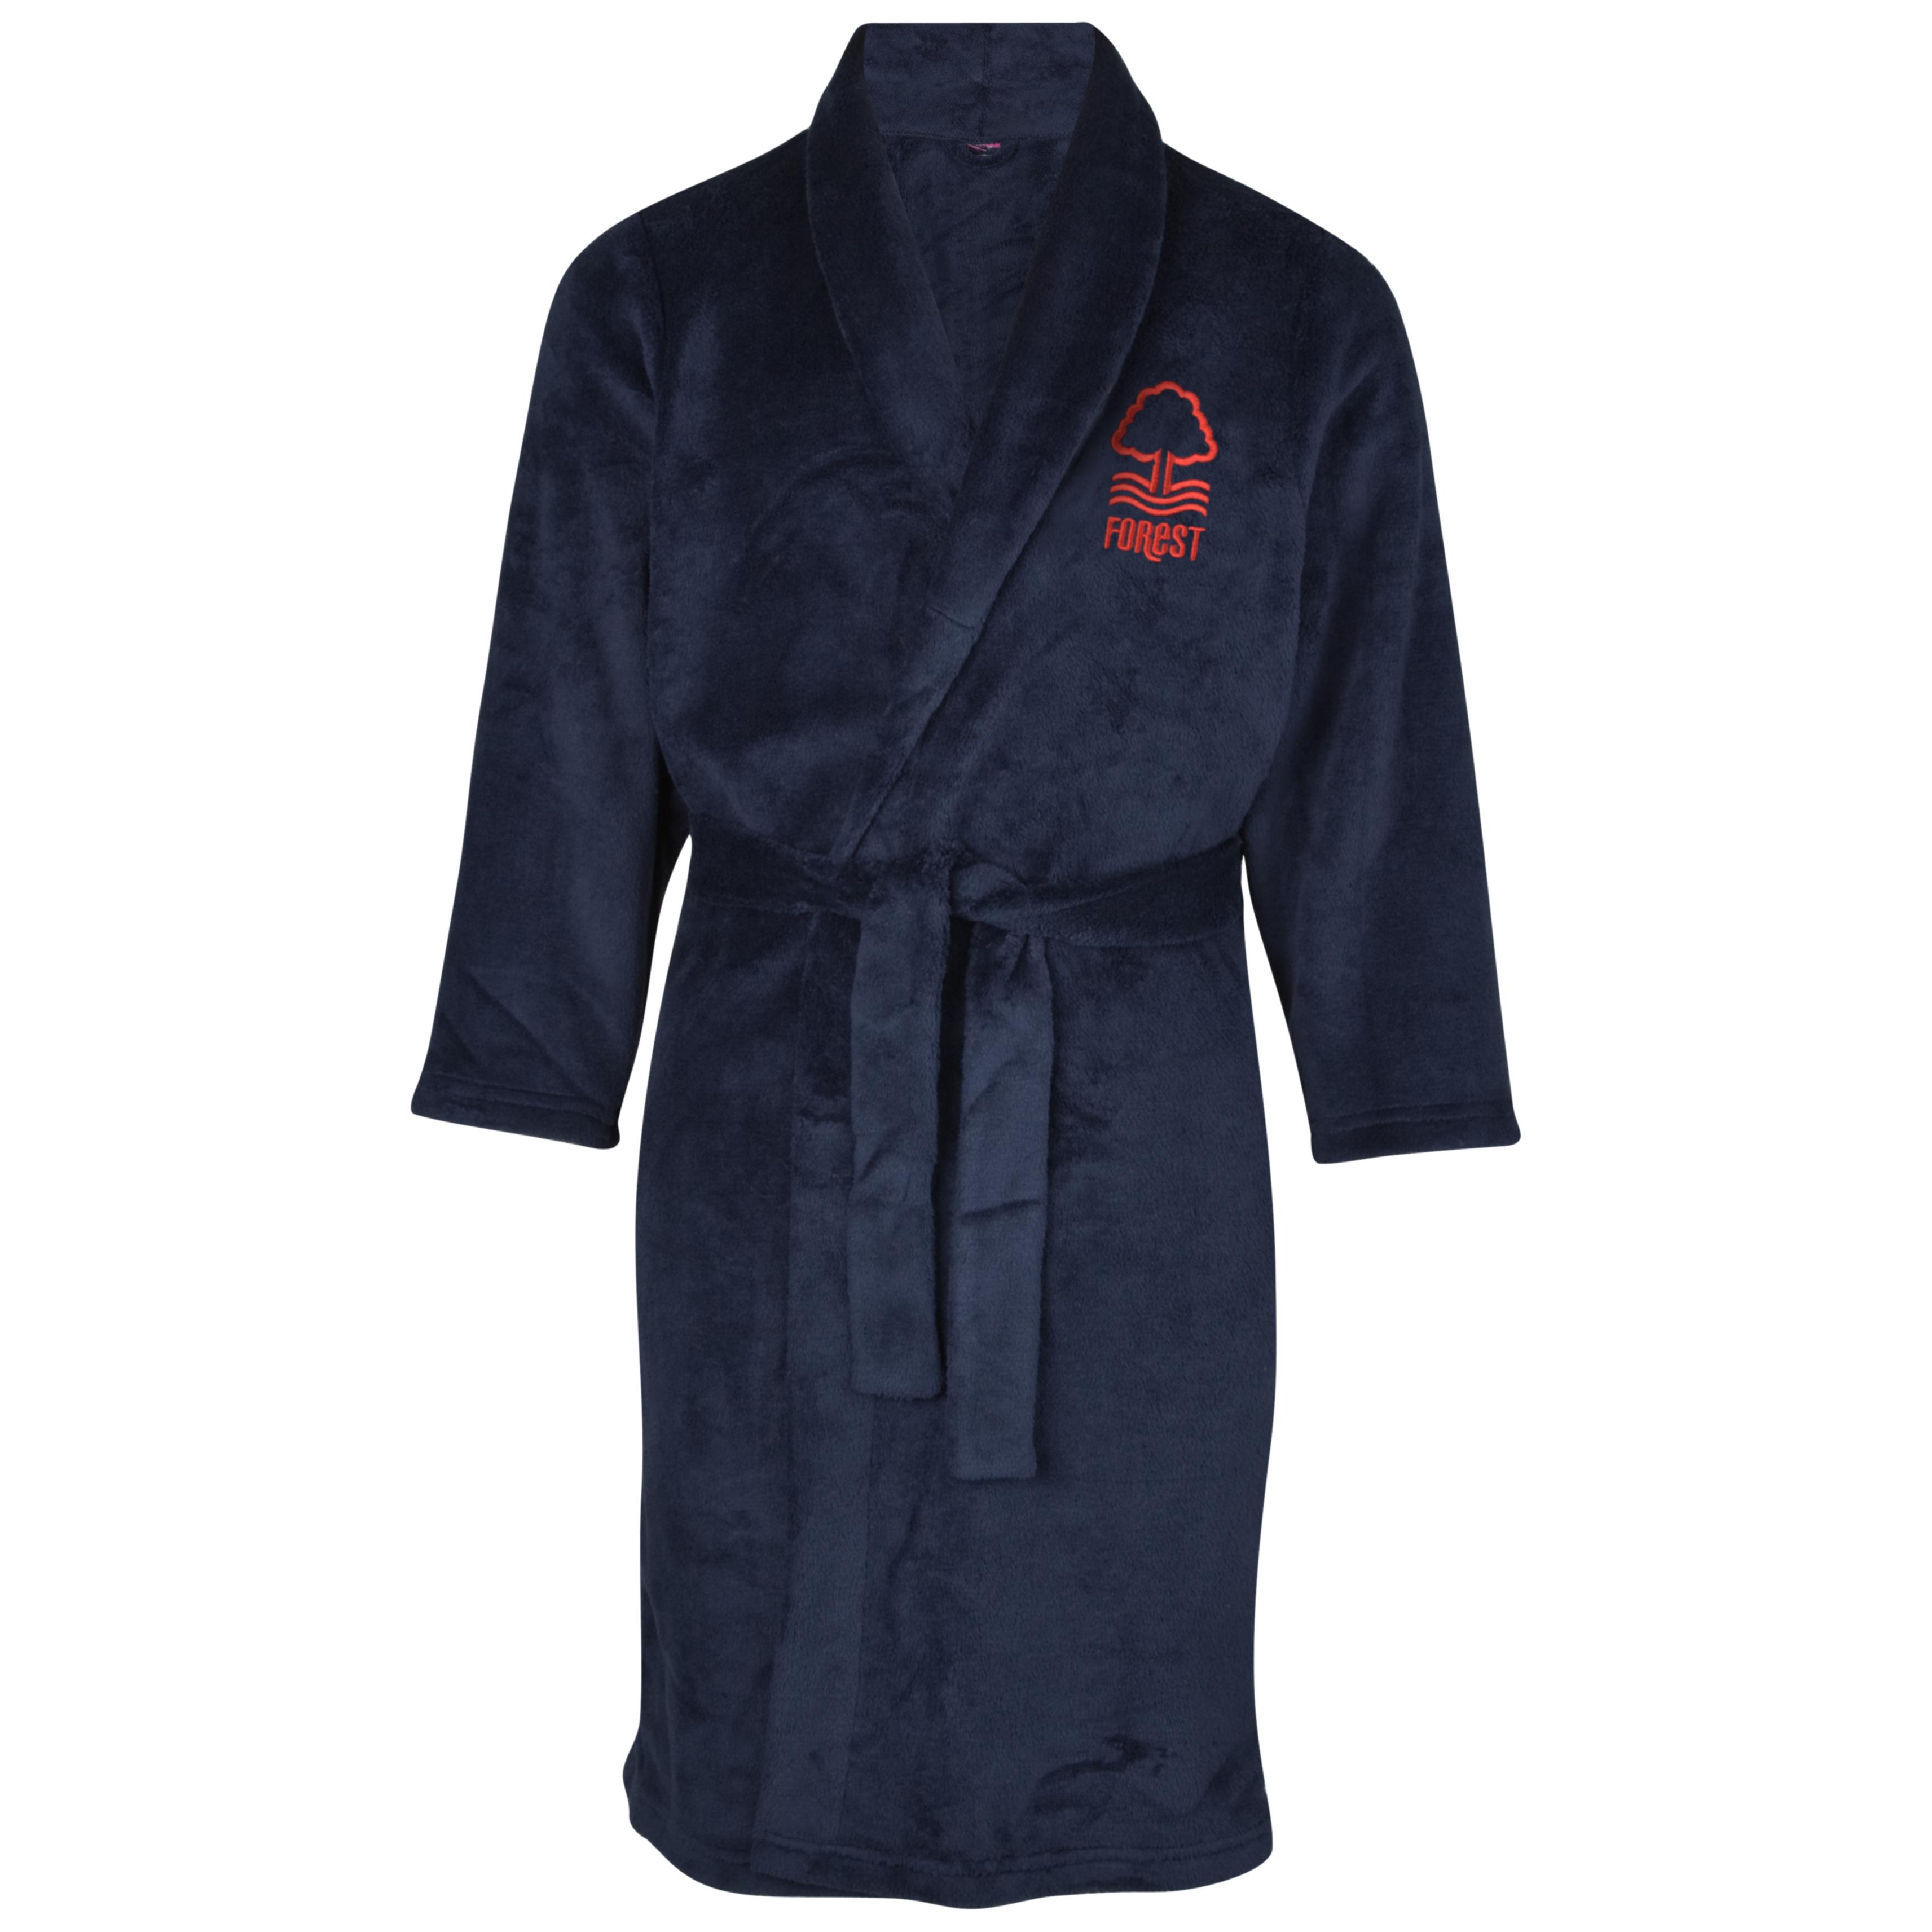 Nottingham Forest Supersoft Robe - Navy - Infant Boys